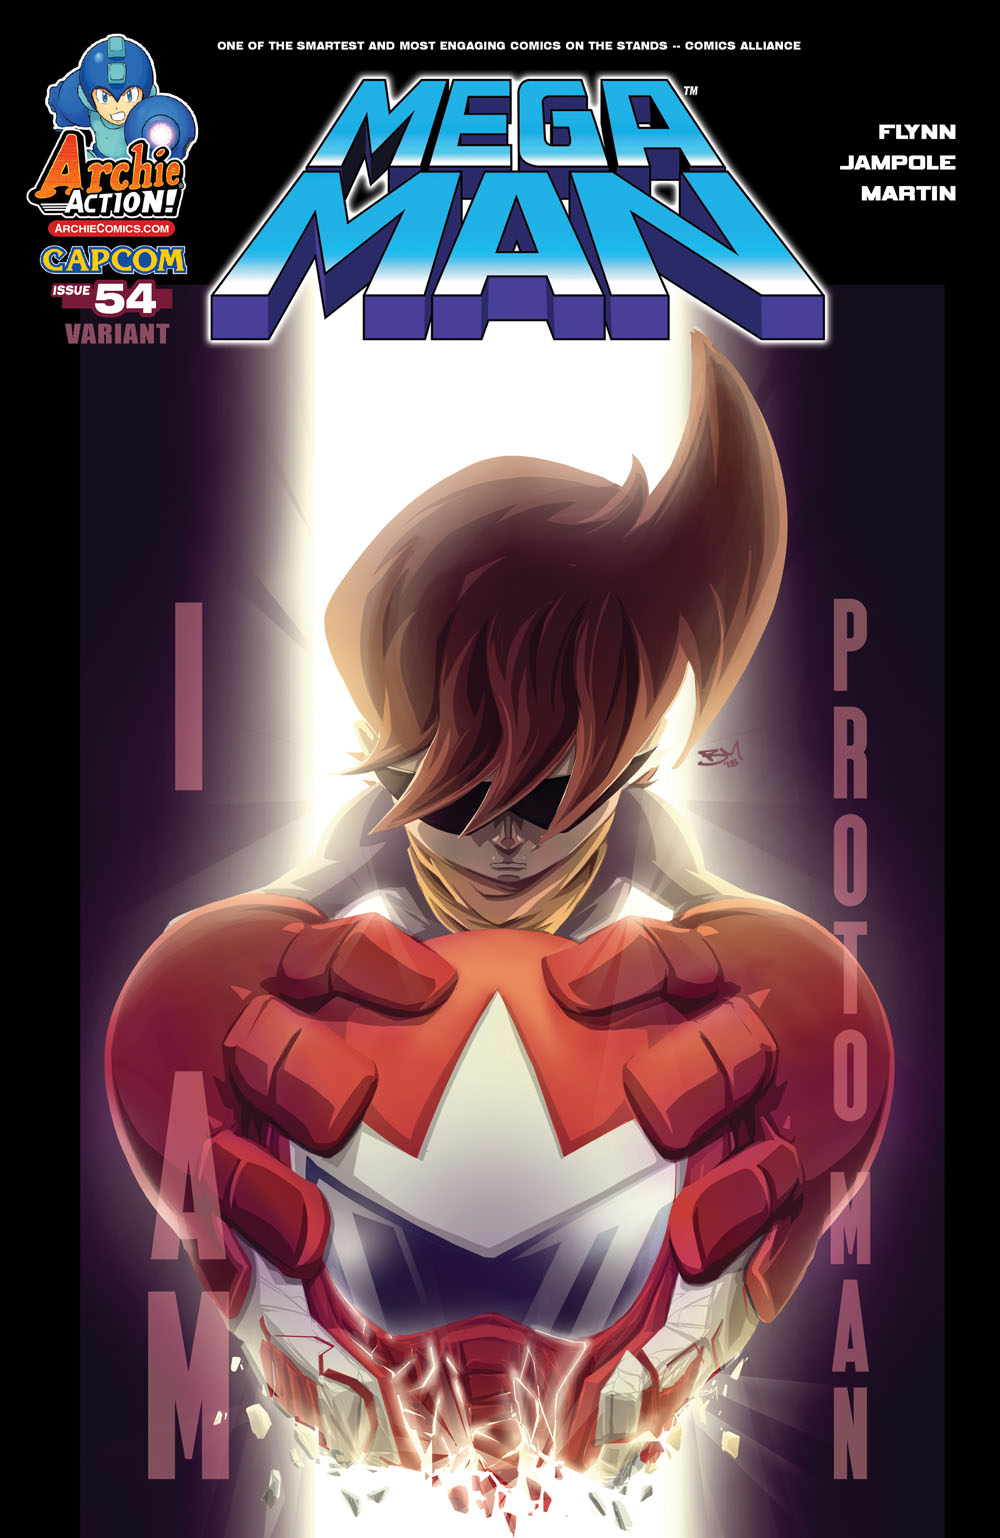 Archie comics archie comics sneak peek of the week major spoilers - Megaman 54 Megaman 54var